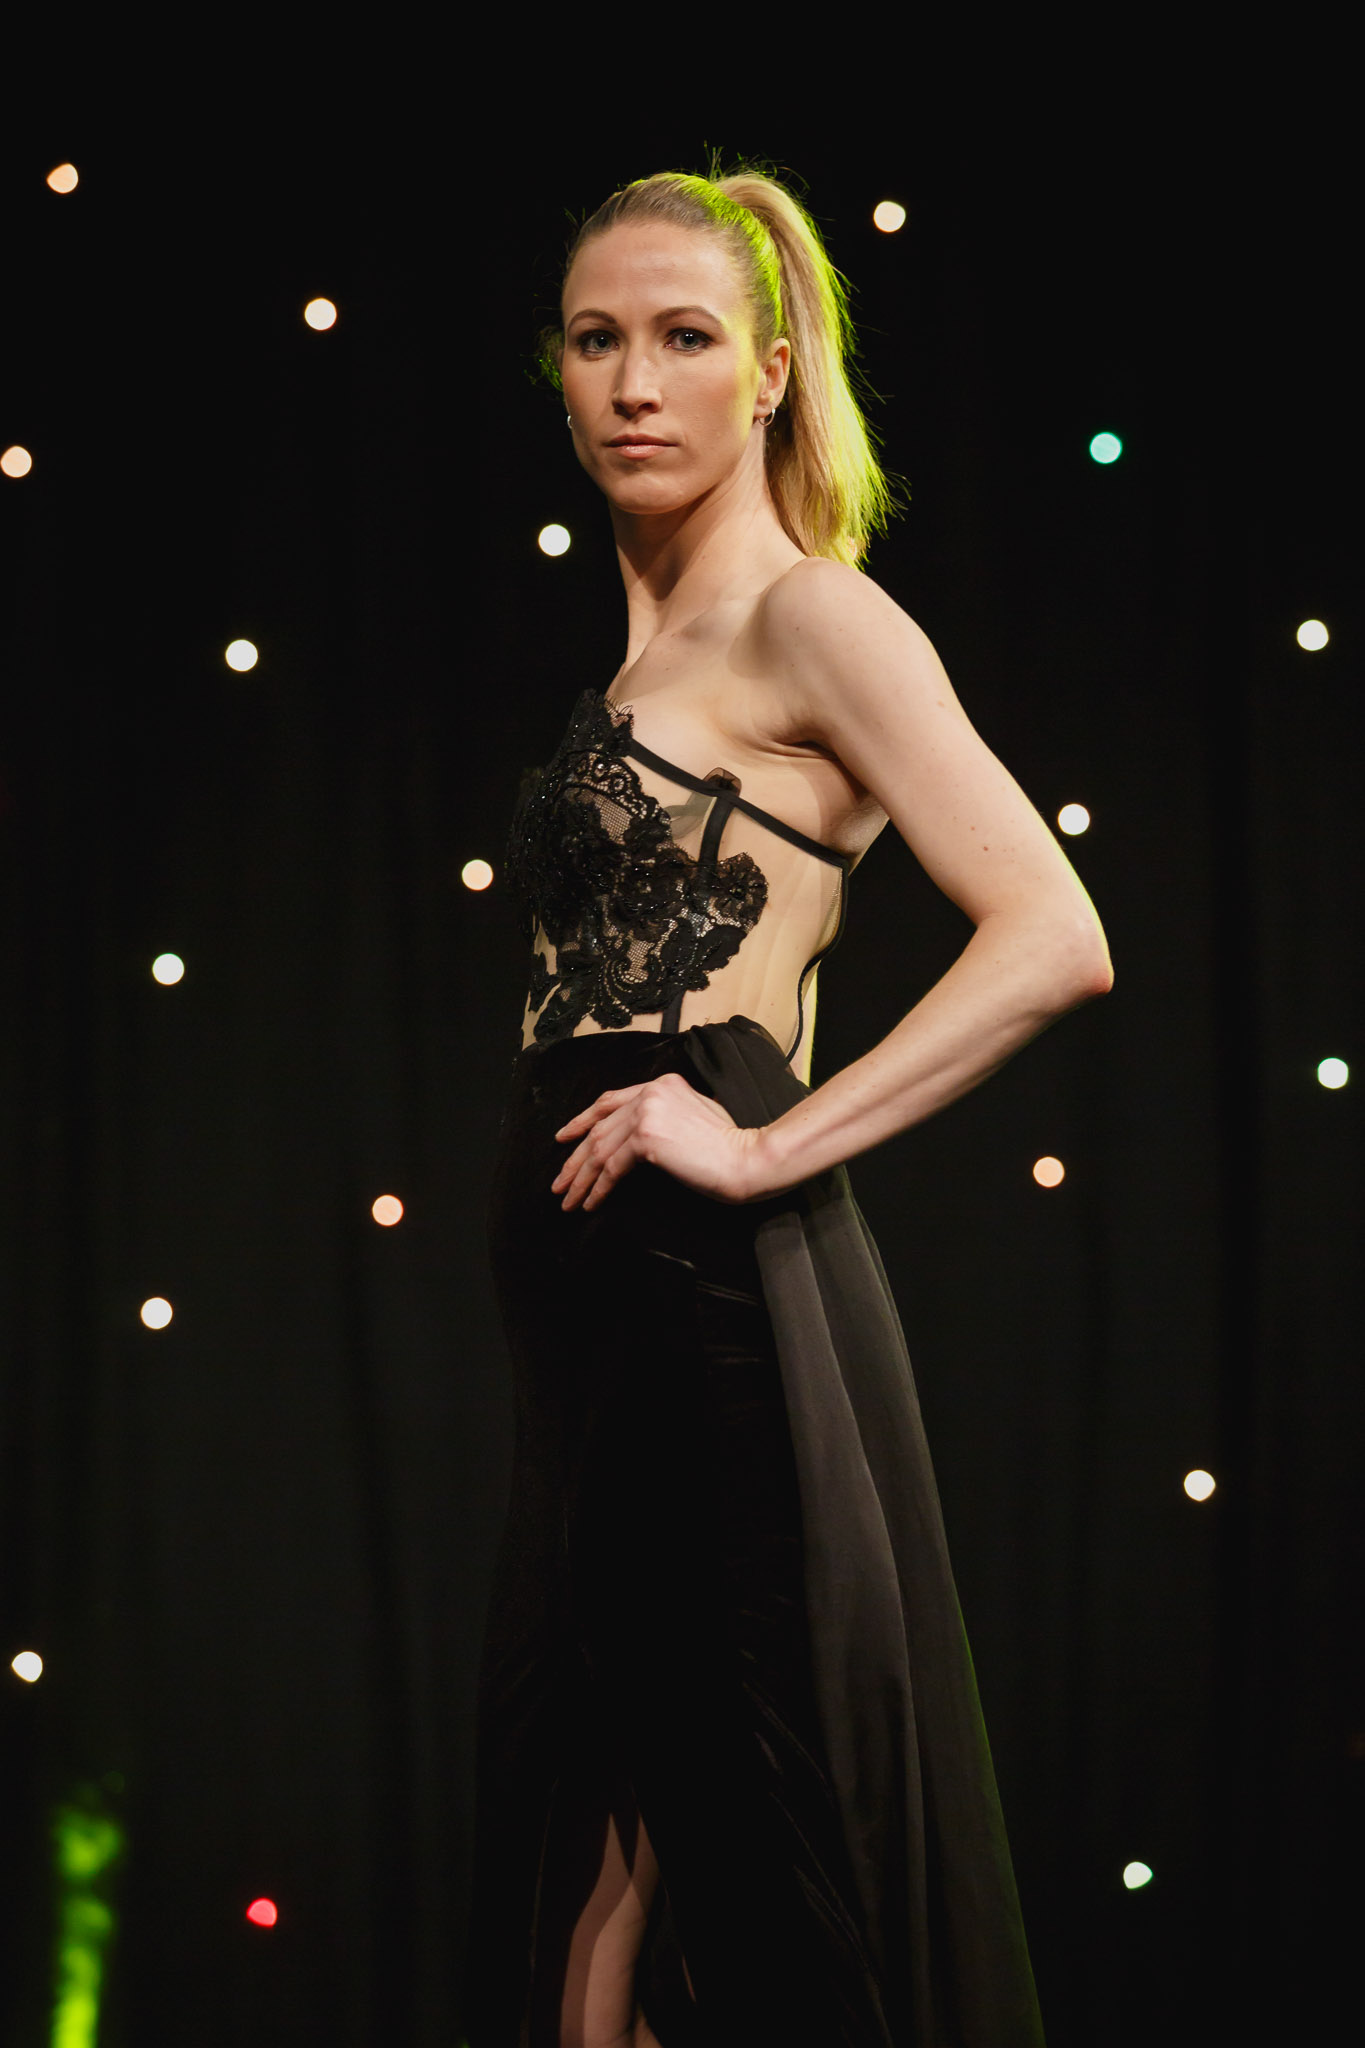 Stylist Fashion Kirsty Milligan